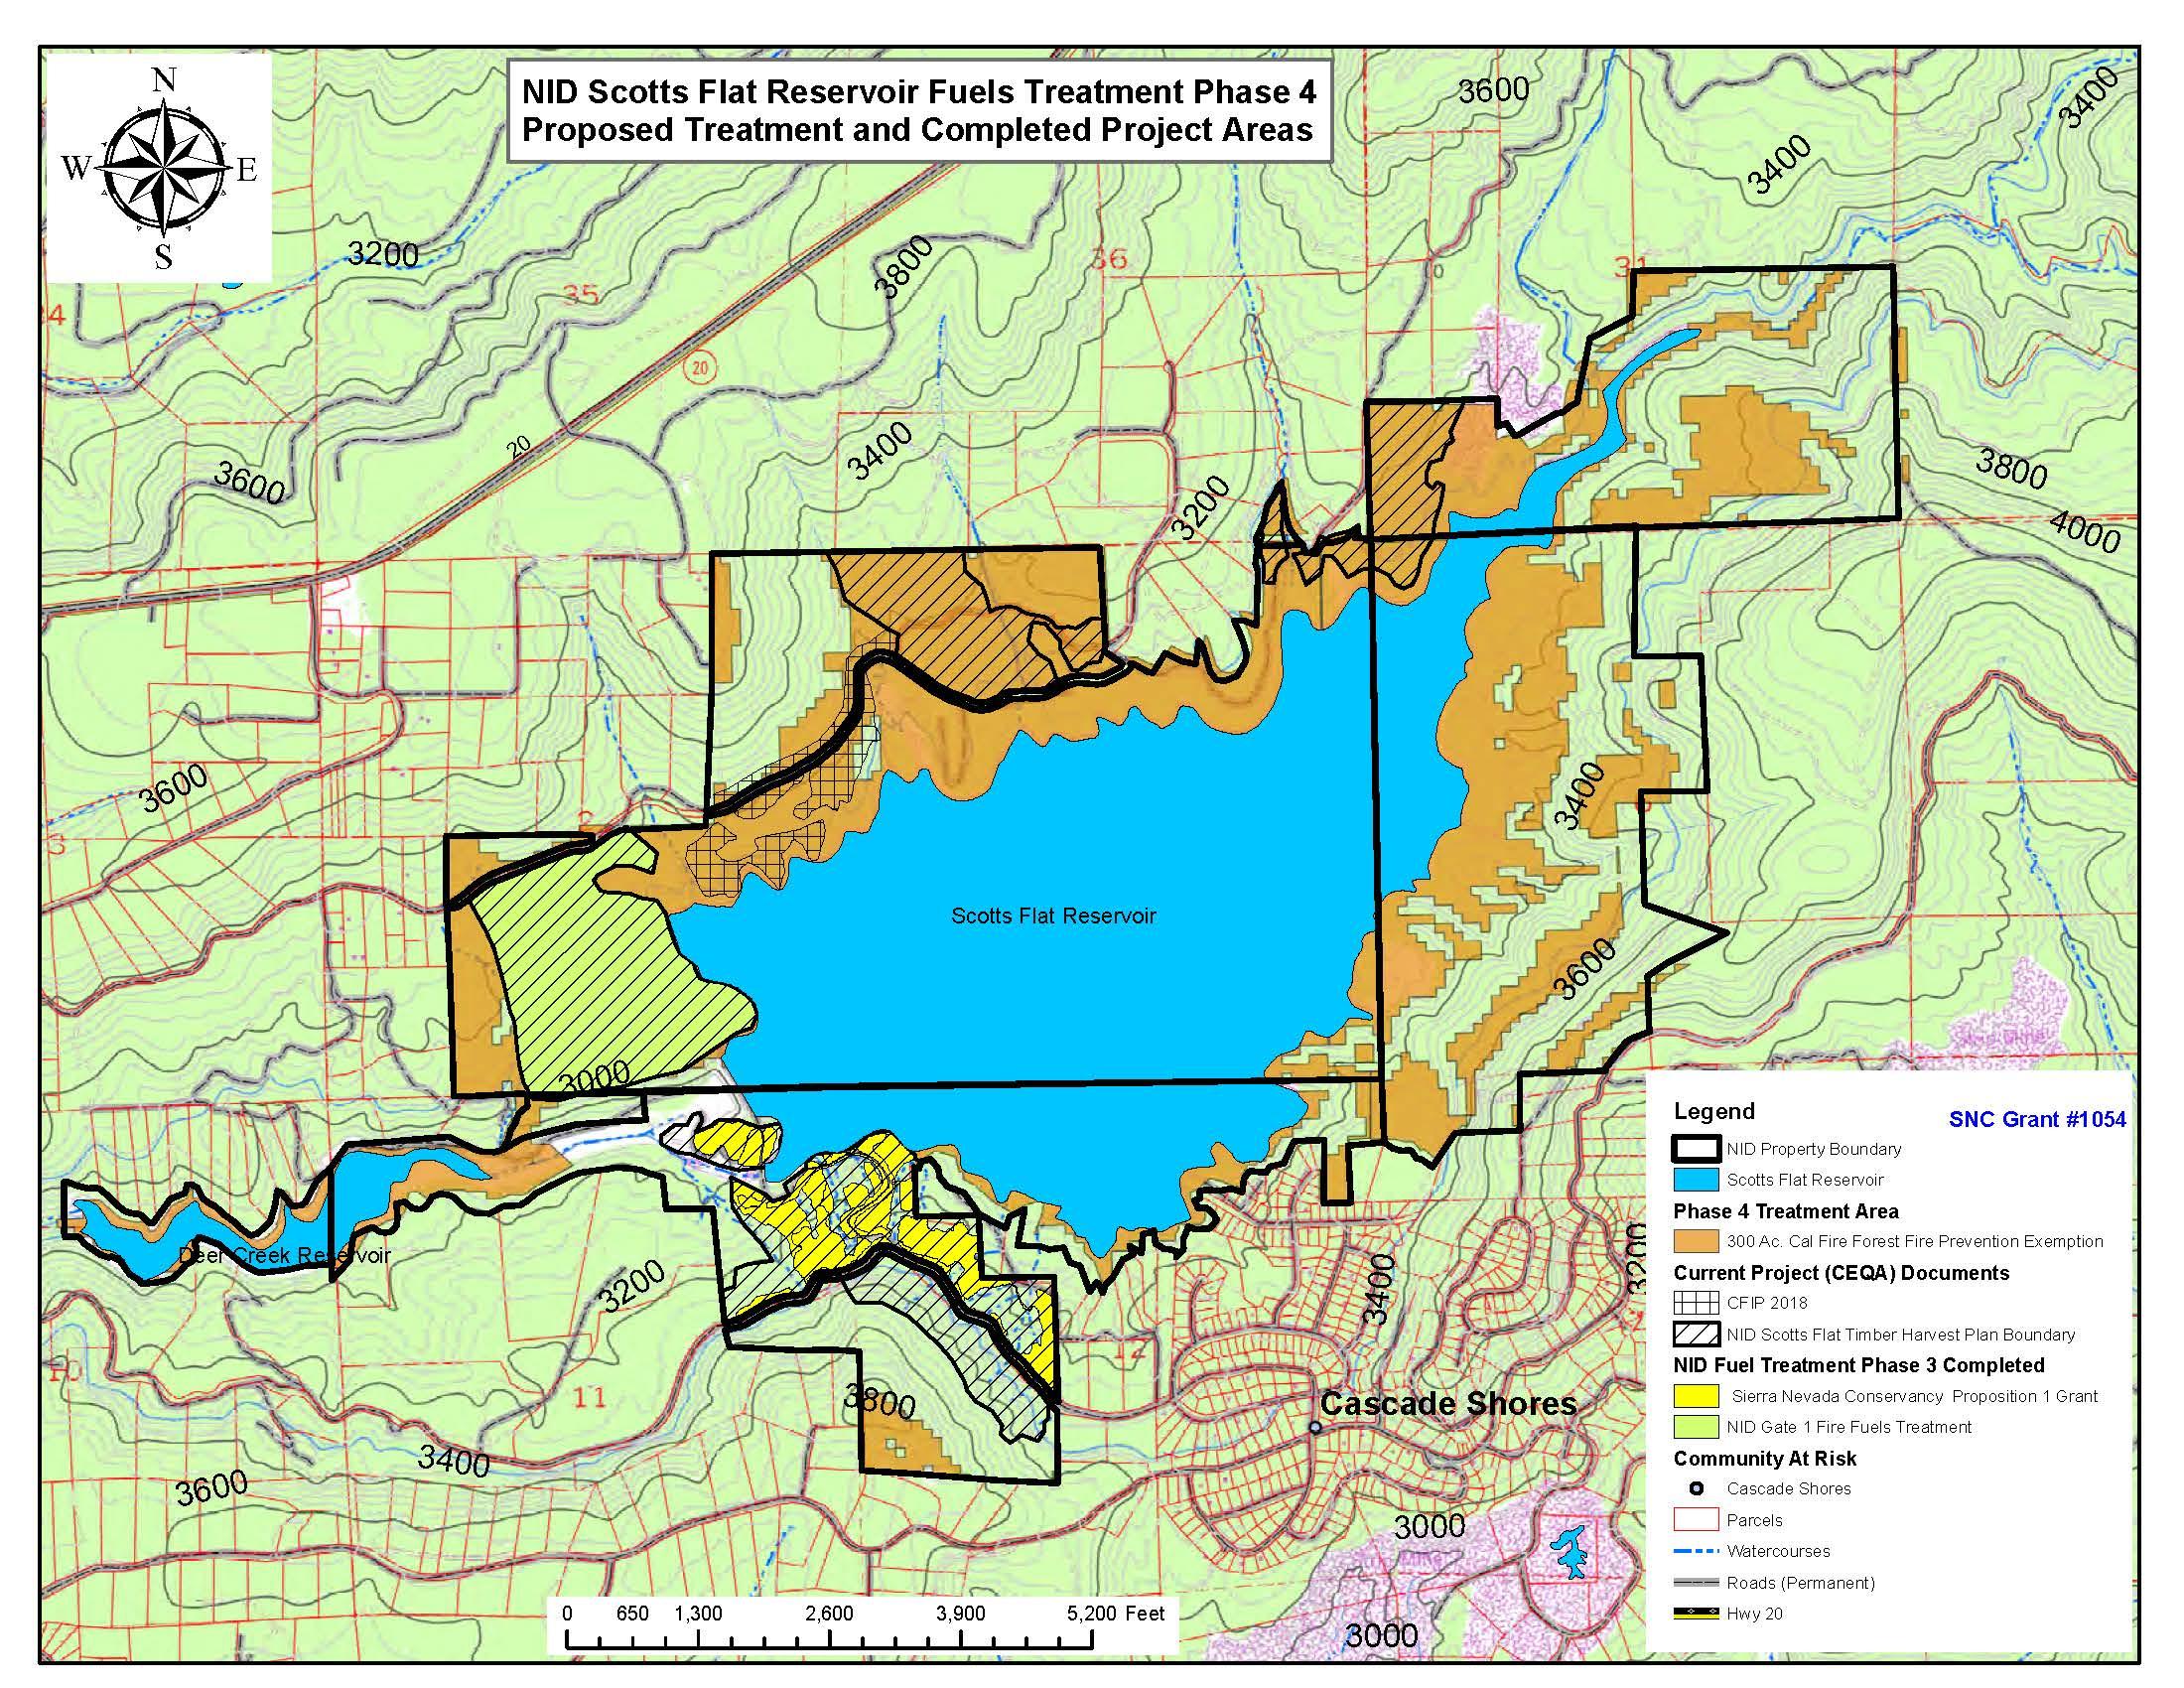 scotts flat lake map Snc Awards Grant For Nid S Phase 4 Fuels Treatment Project At scotts flat lake map